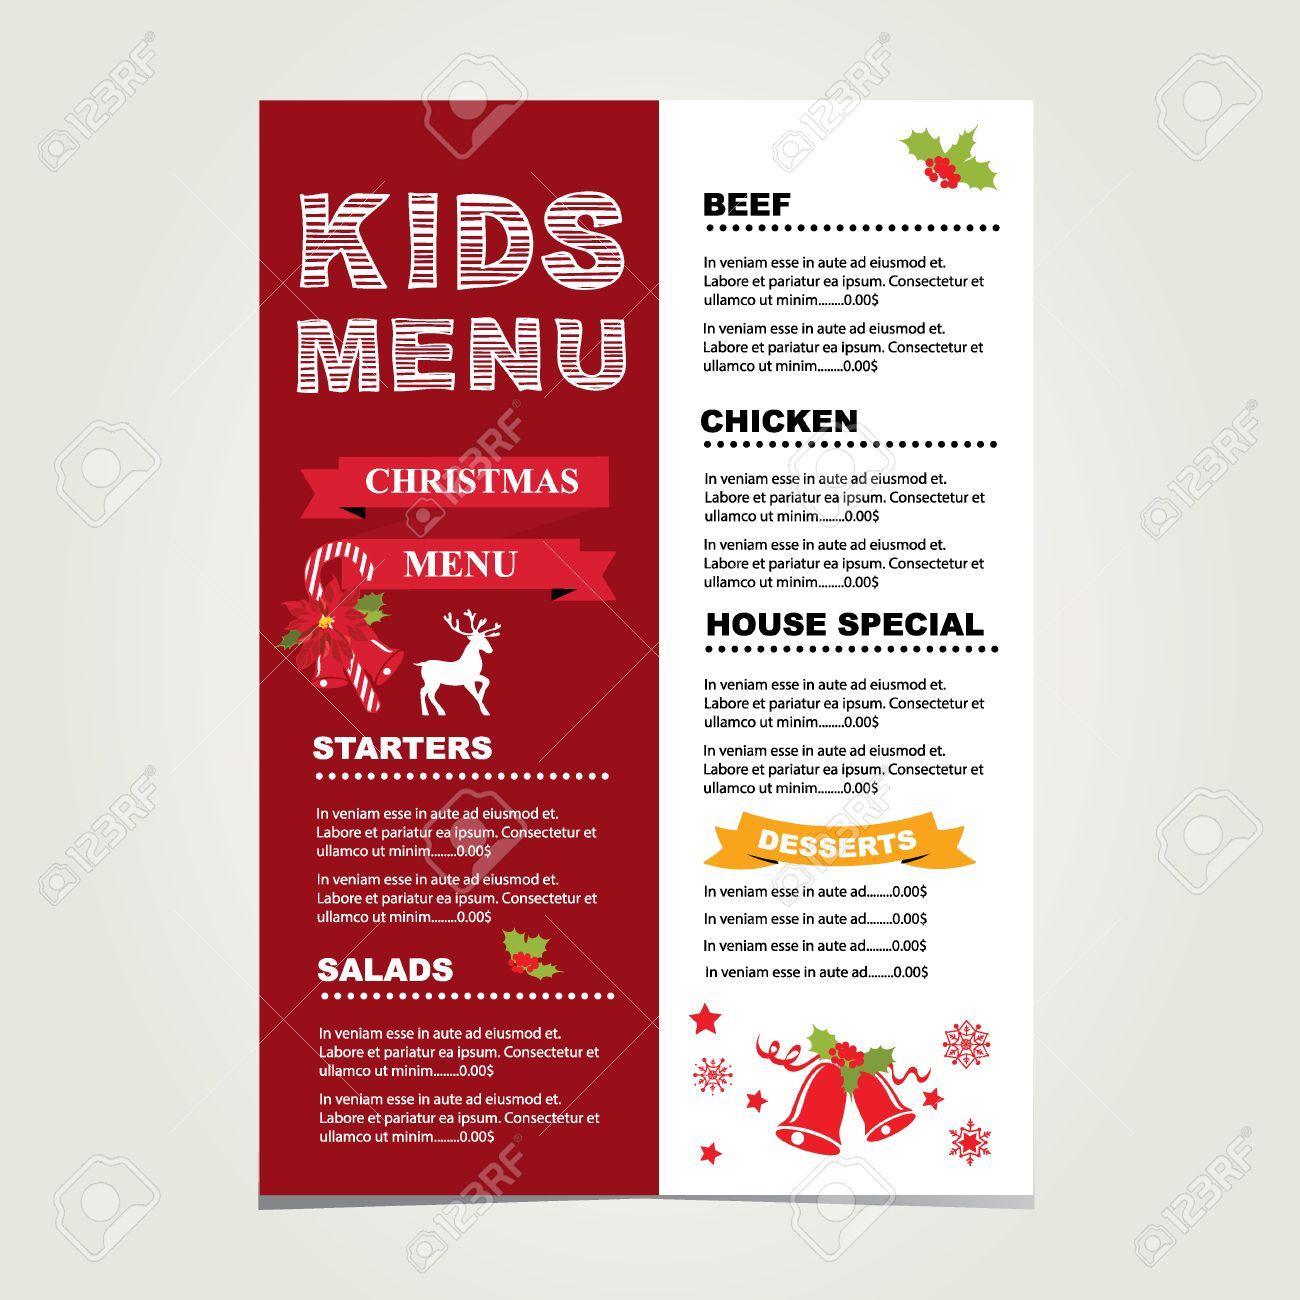 Design Templates Menu Sample Christmas Menu Please Accept This 33308981 Kids  Menu Christmas Vector Template Stock